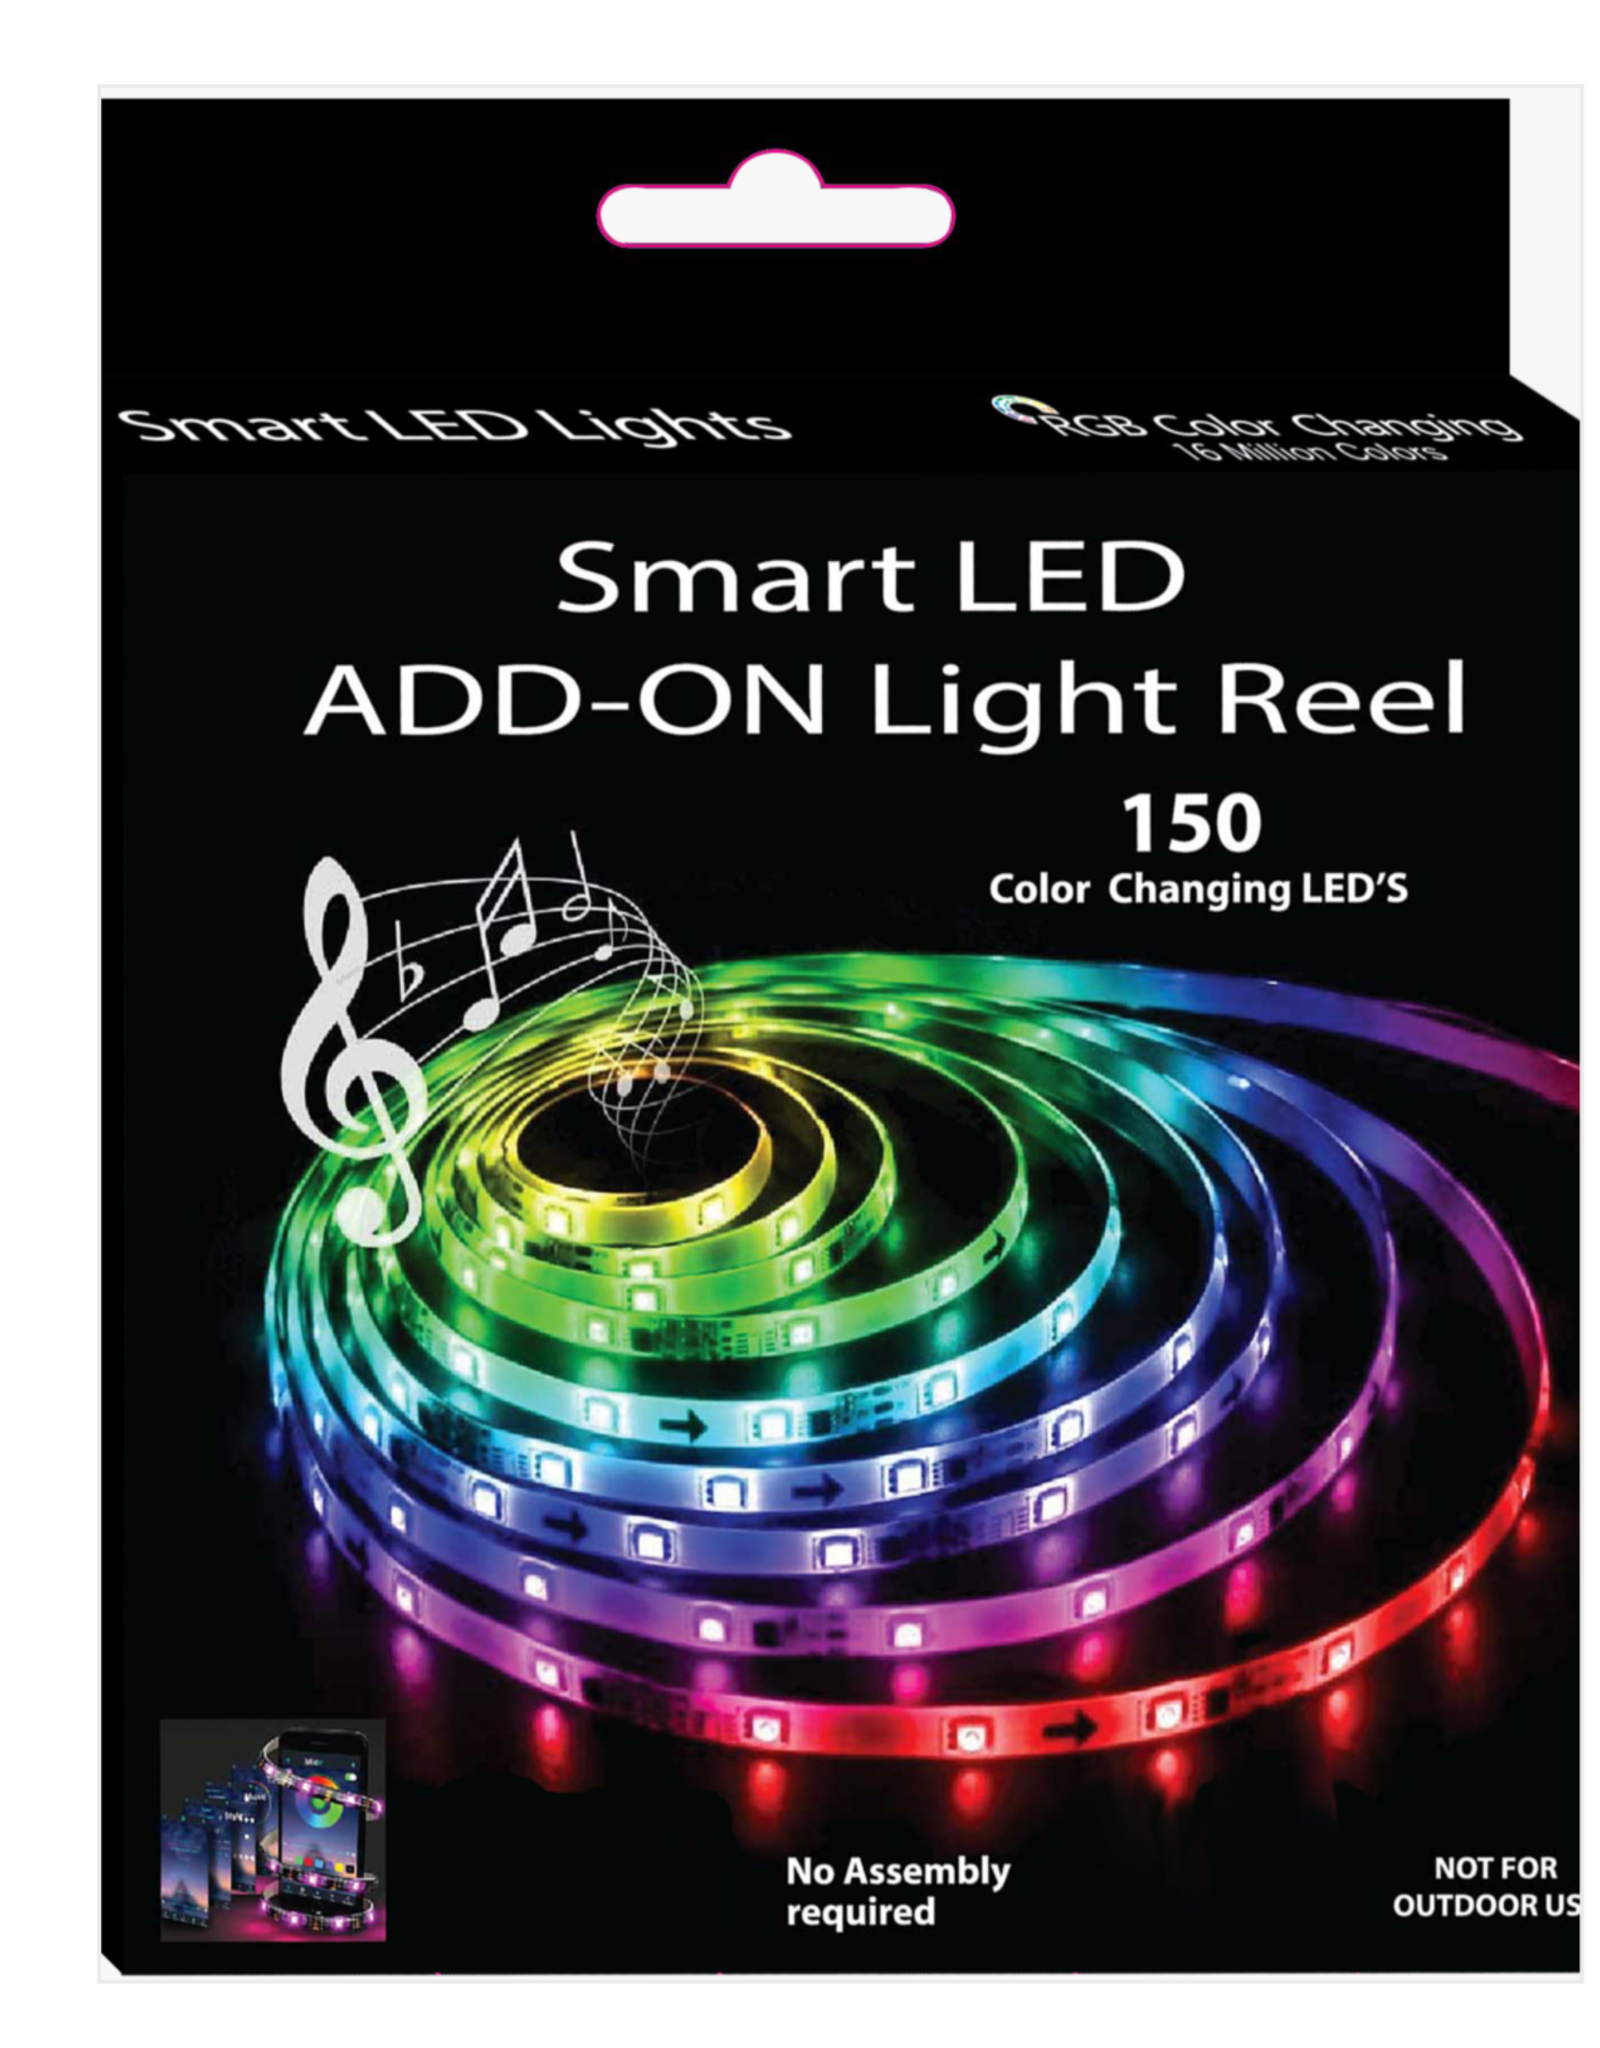 Smart LED Add-On Reel - 150 Color Changing LED's